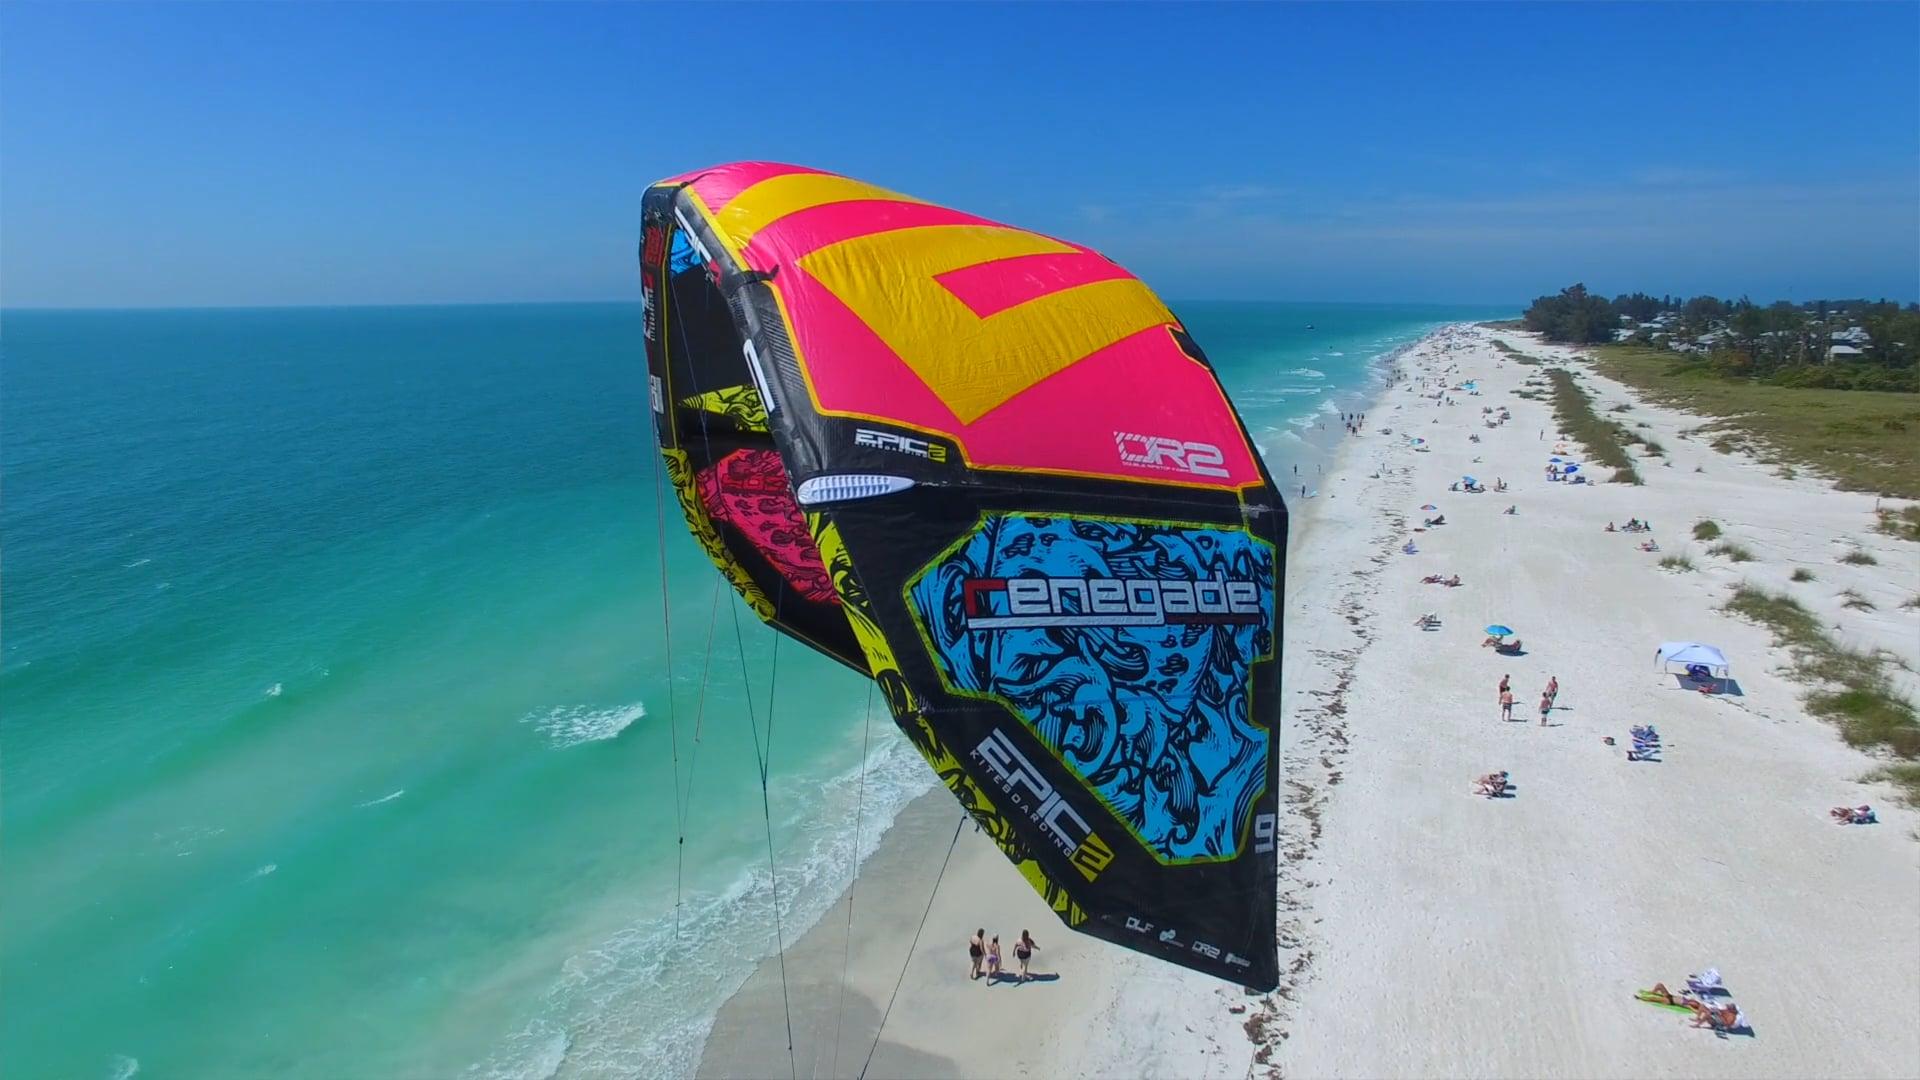 RENEGADE kites 6G - with Epic Kites Kiteboarding